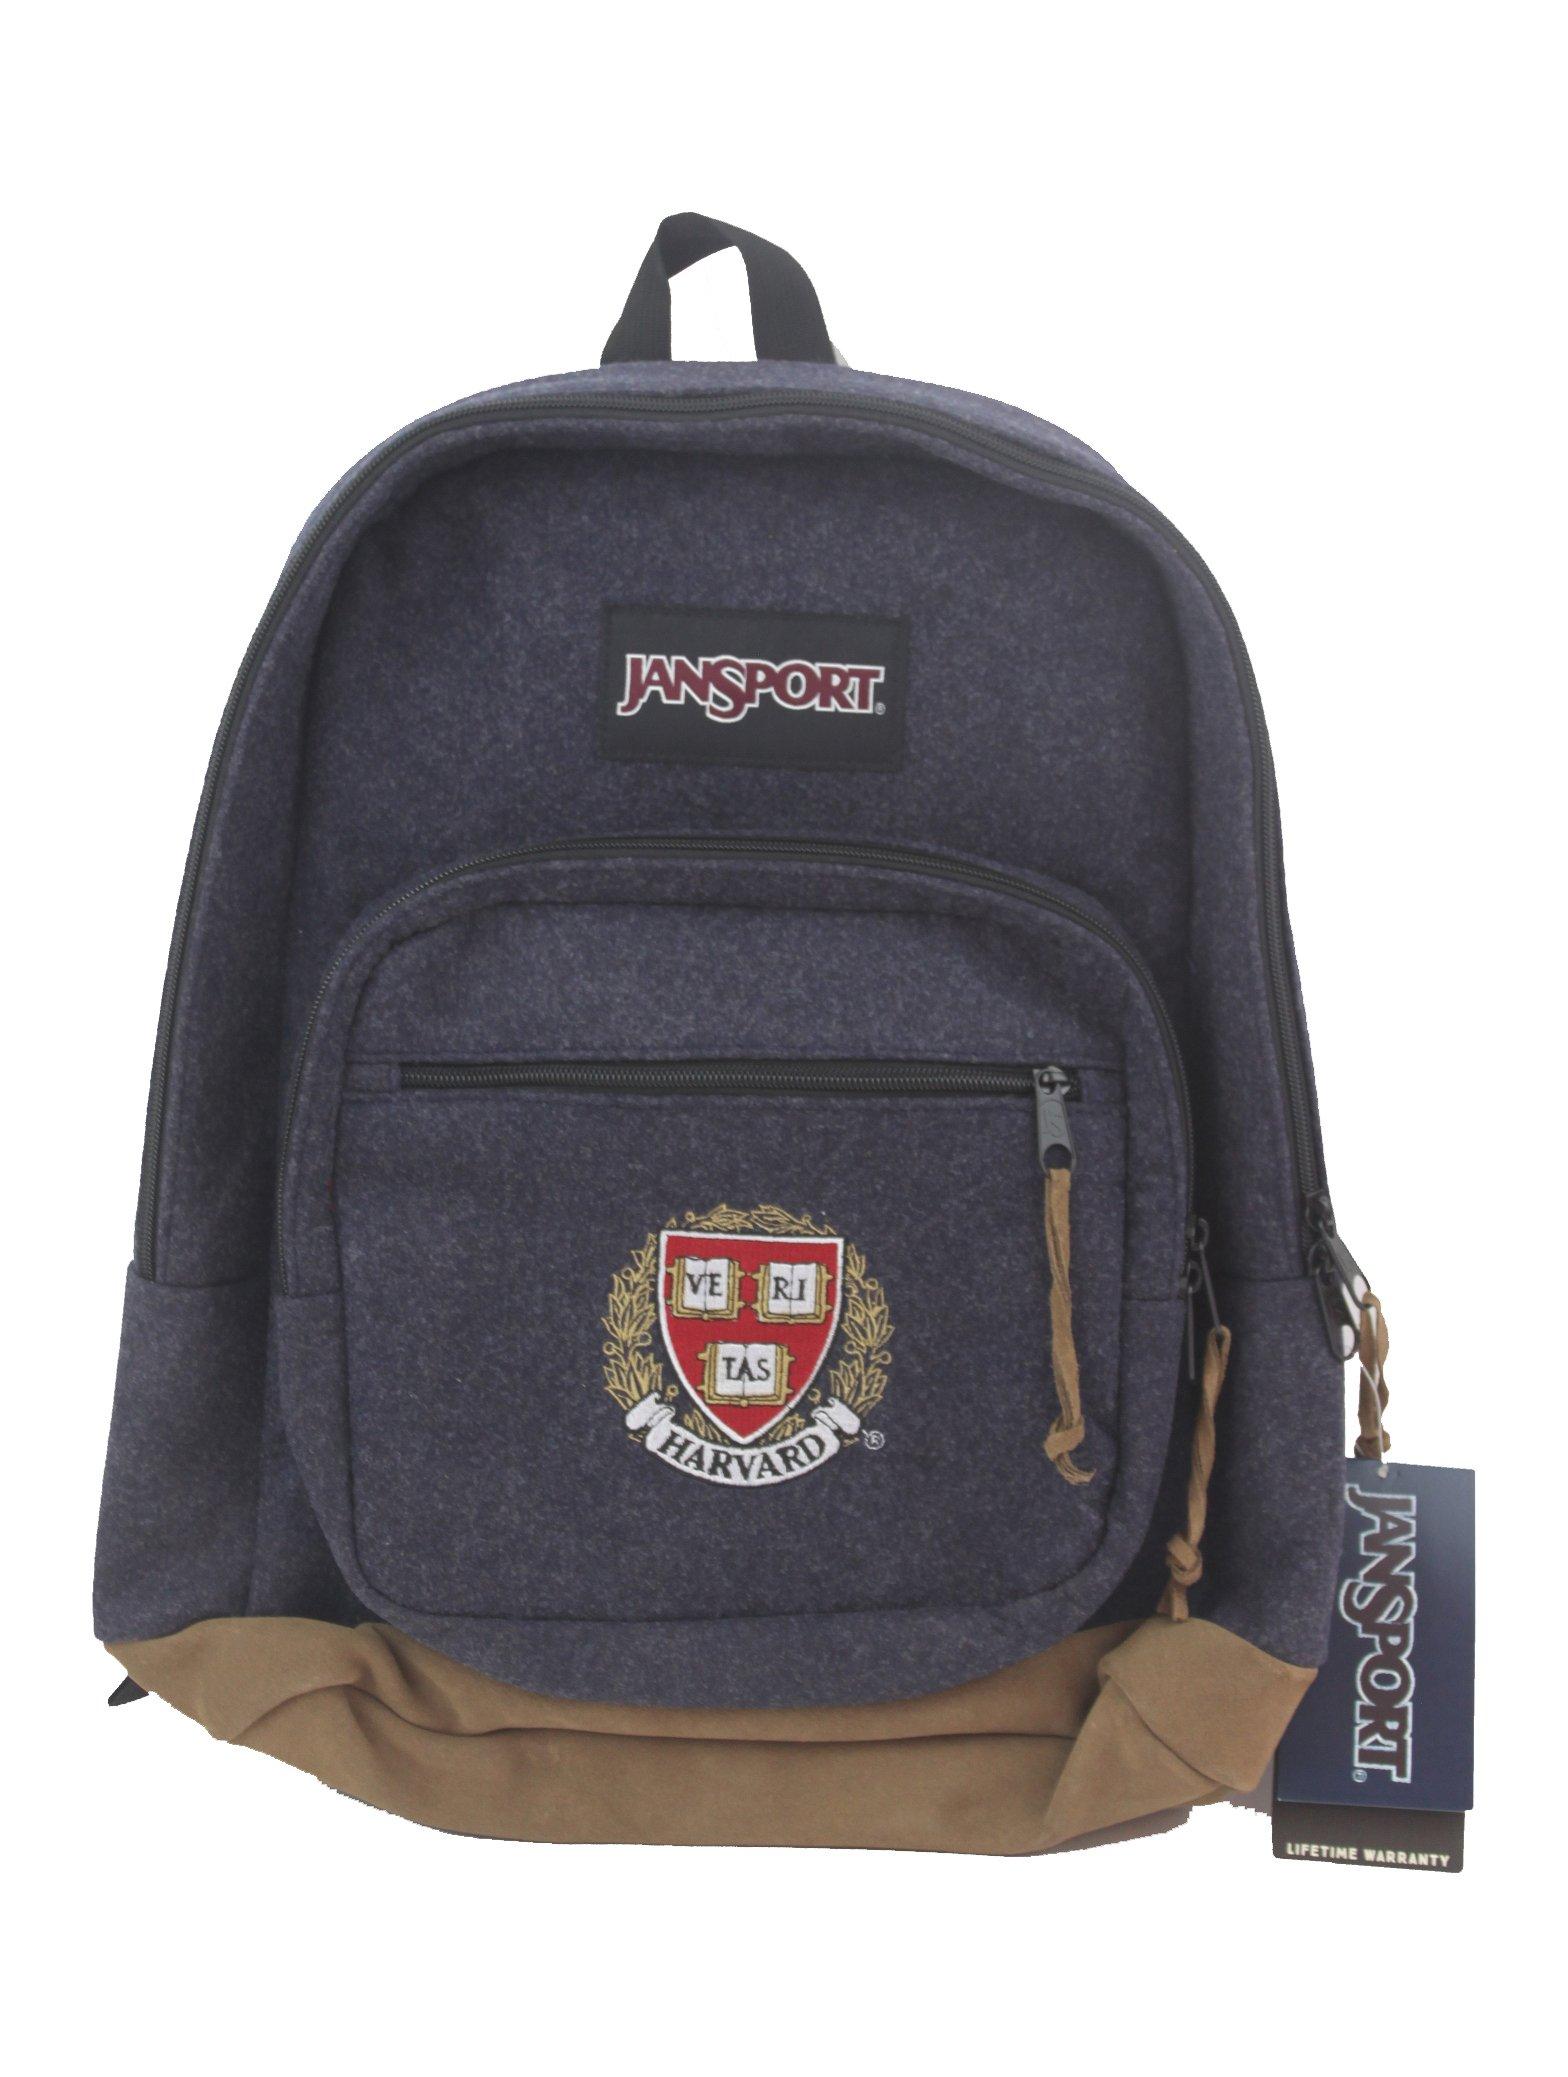 Jansport Right Pack D.E. Digital Edition Laptop Tablet''Harvard'' Collegiate Backpack (Navy Blue Felt)